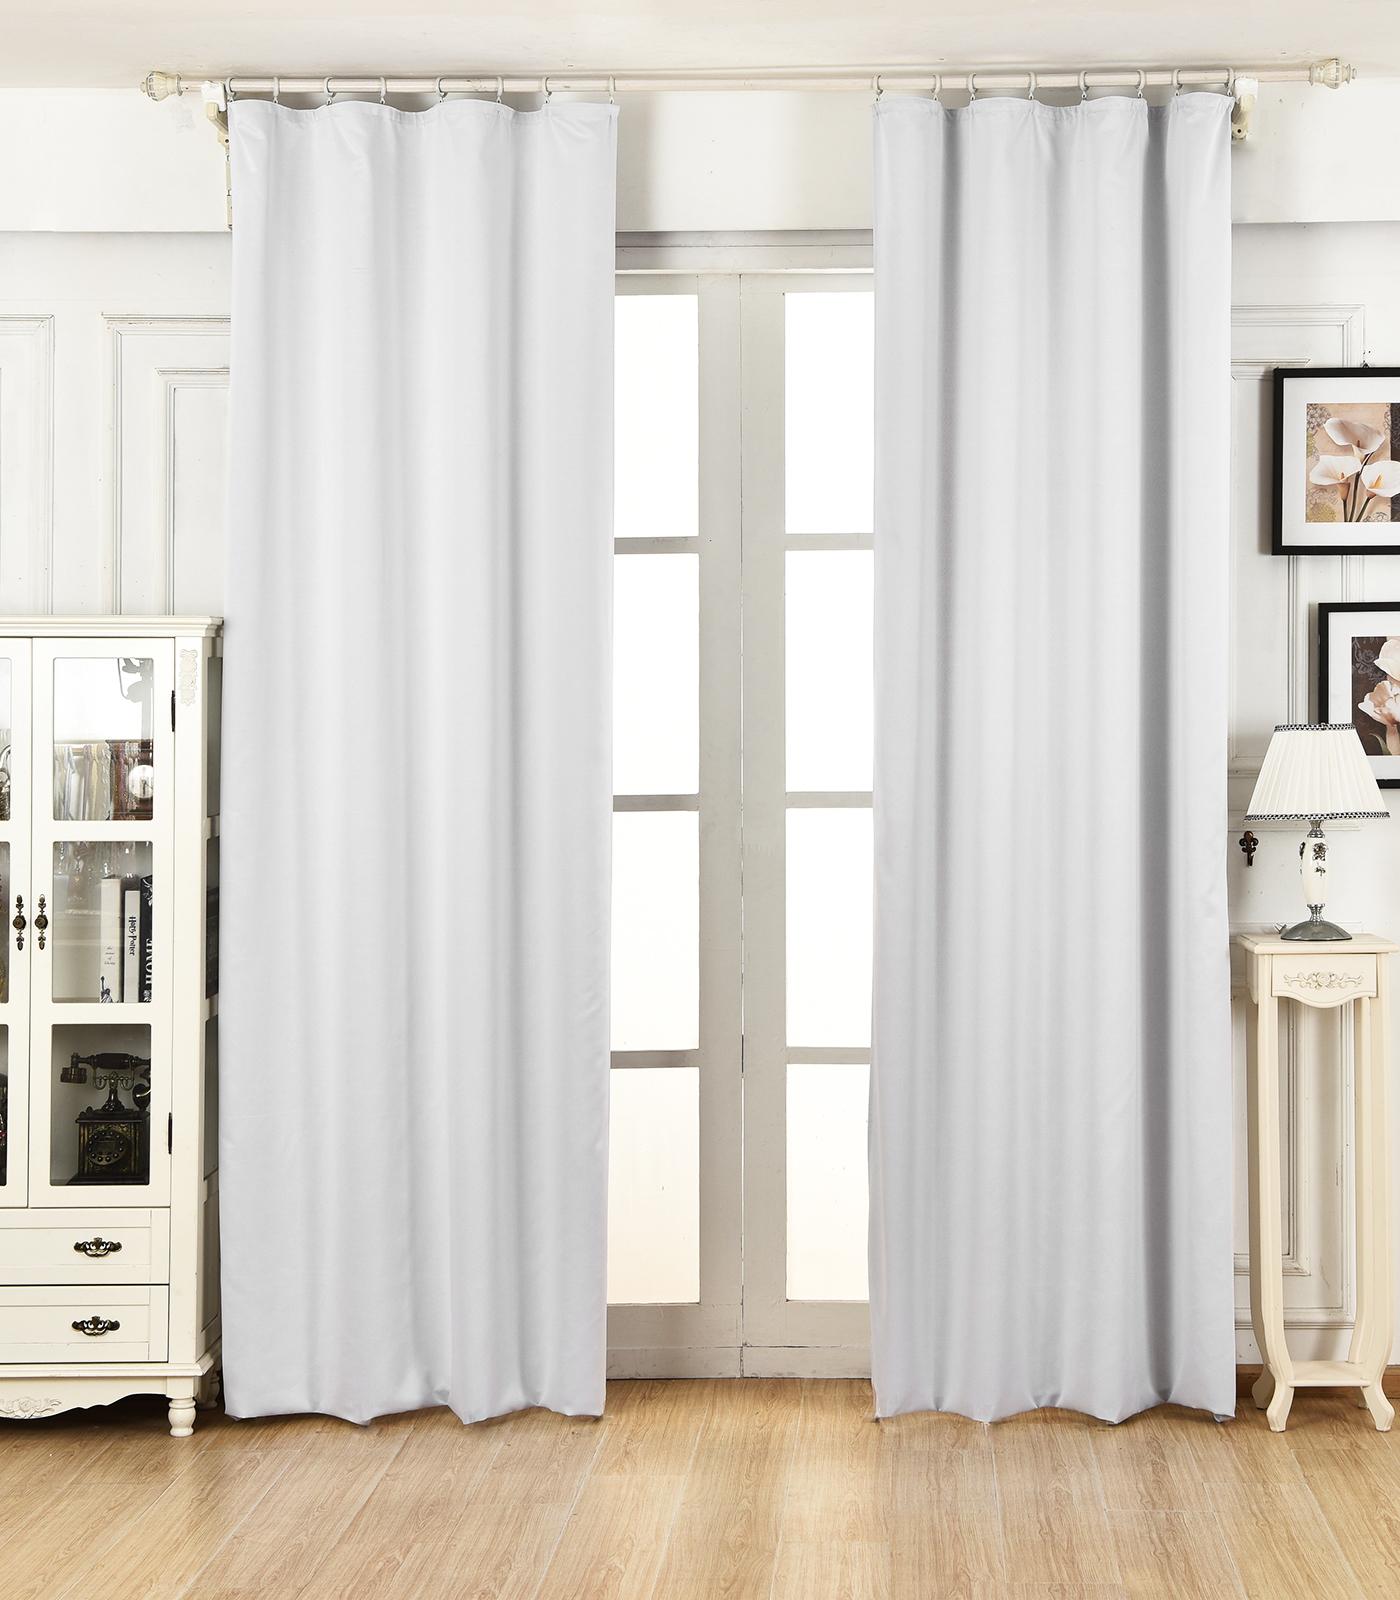 1 rideau occultant avec oeillets rideau thermique isolant f136 ebay for Rideau occultant isolant